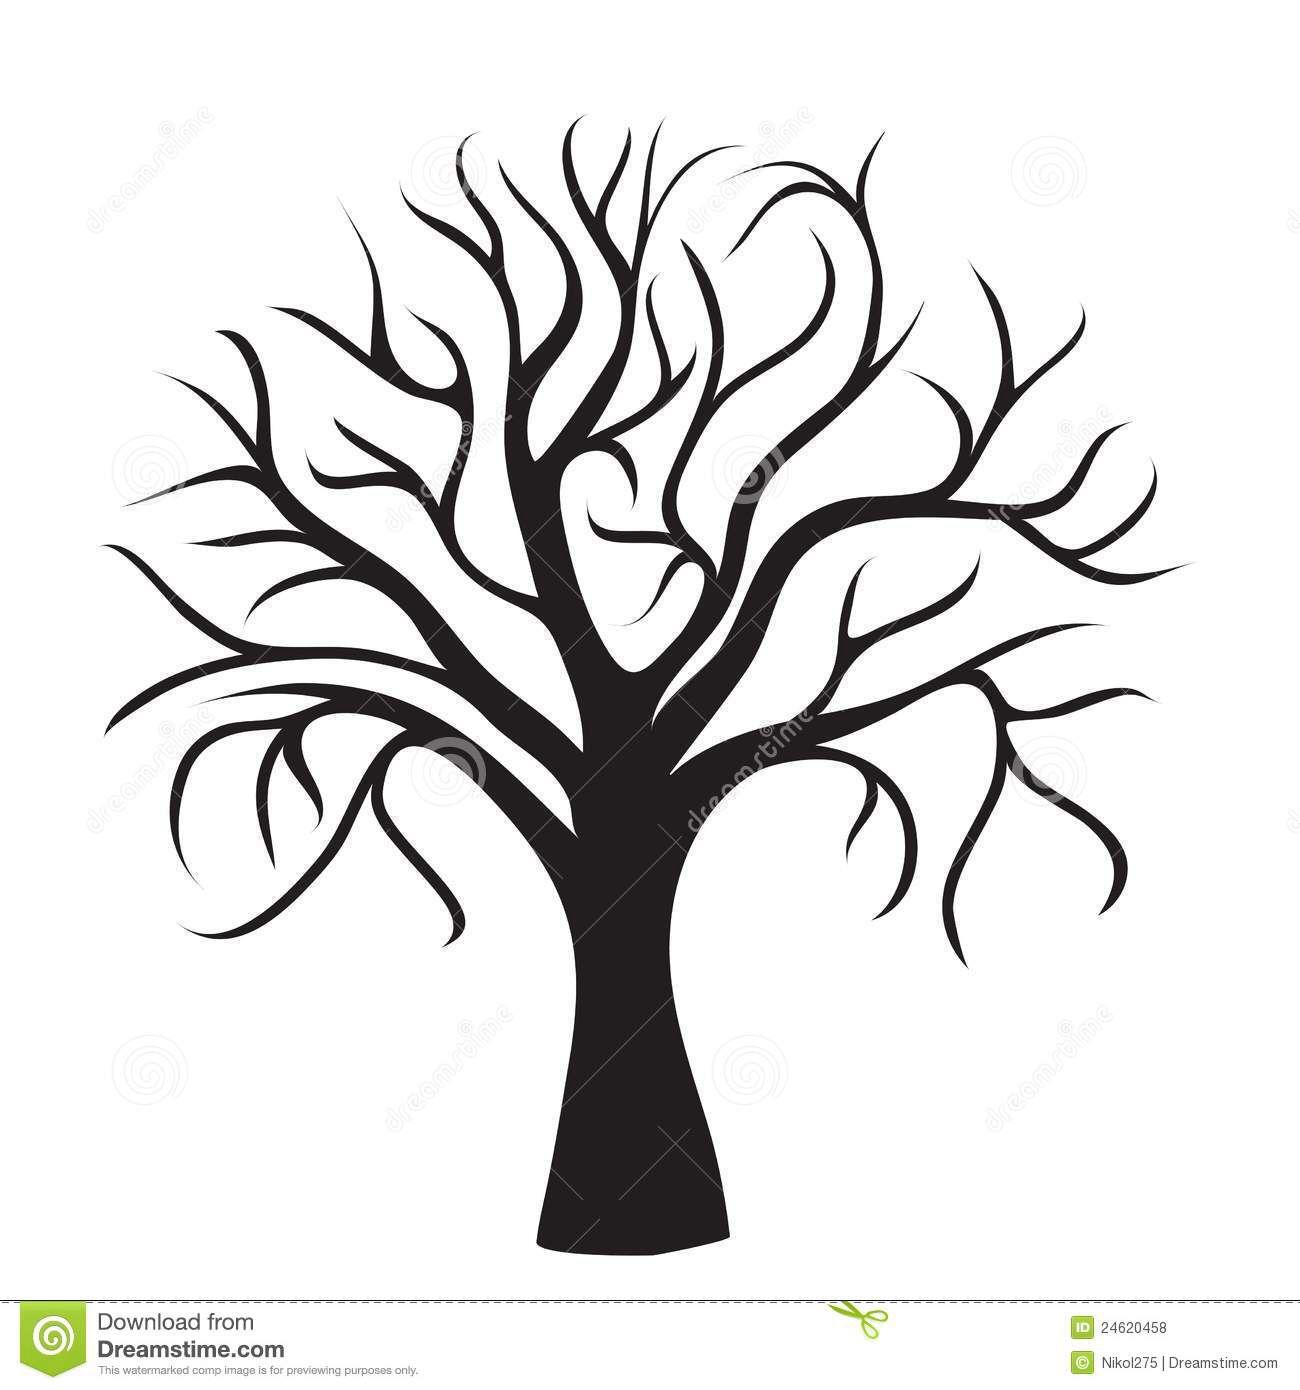 Tree no branches Black tree, Tree outline, Tree silhouette